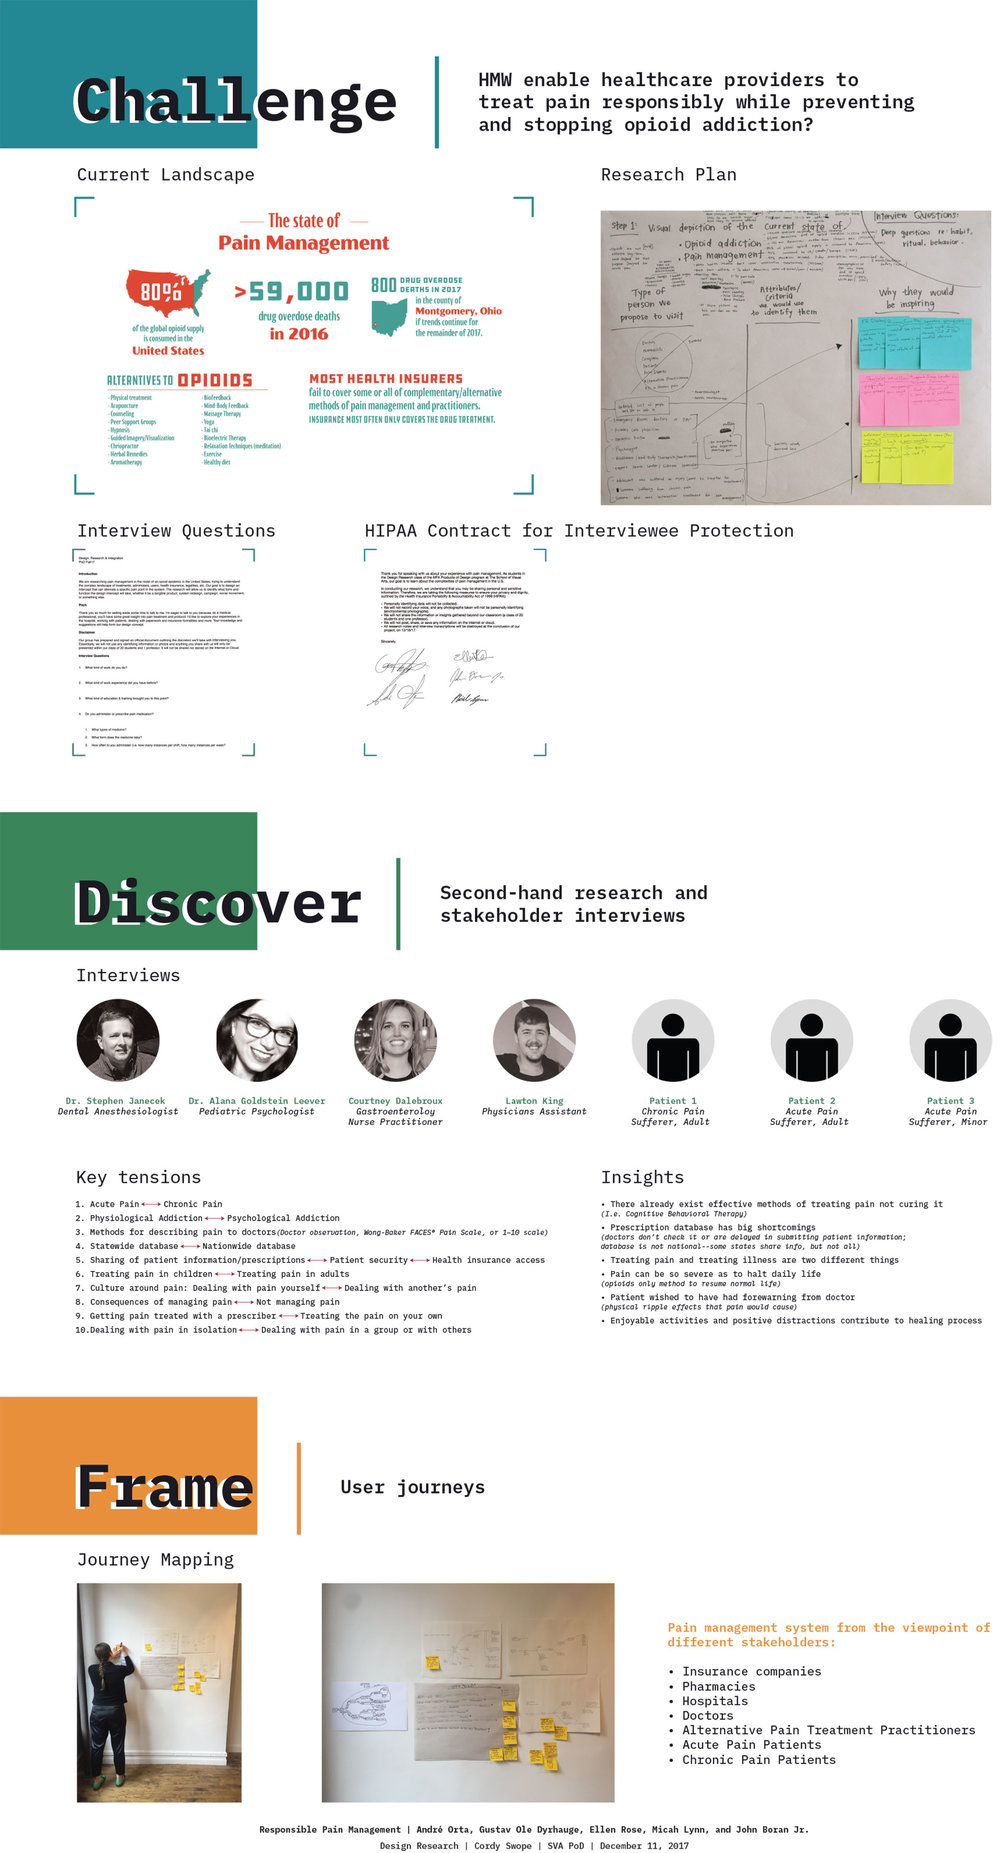 final-posters-01_Pain-Management_Design-Integration_11-Dec-17.jpg